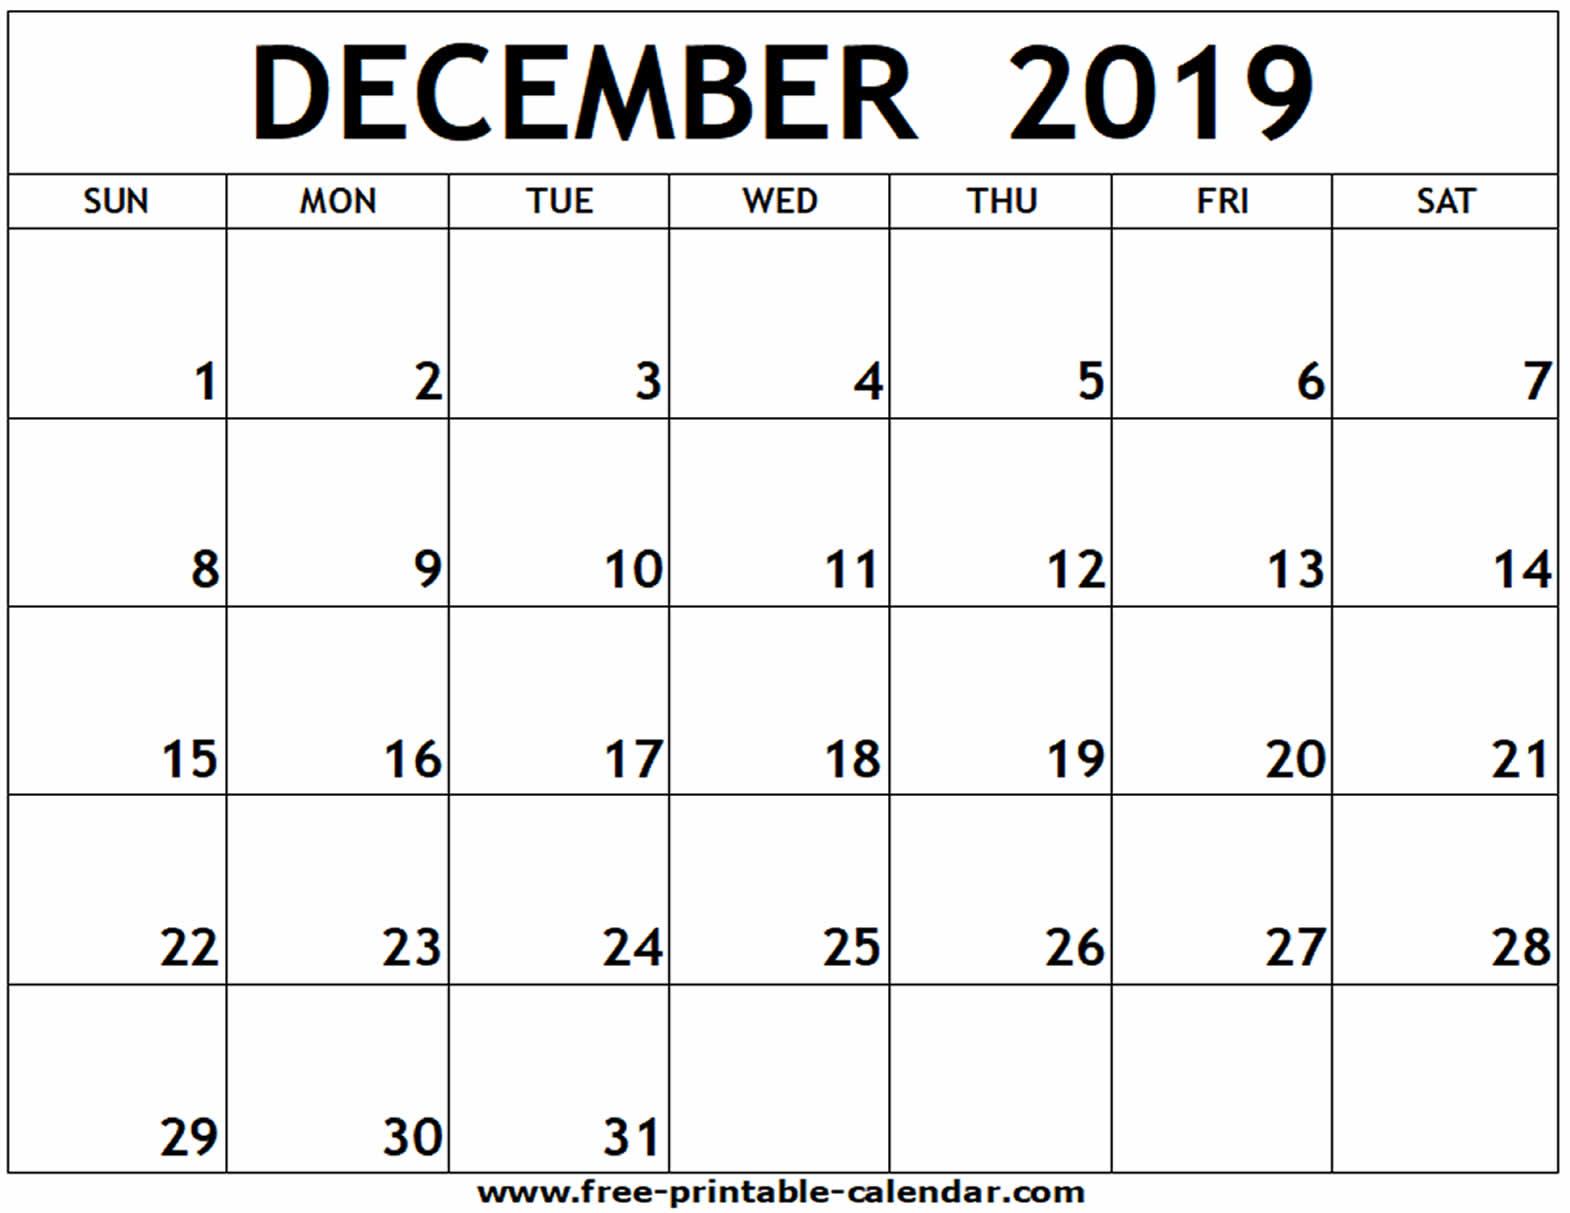 December 2019 Printable Calendar - Free-Printable-Calendar for Blank Calendar For December